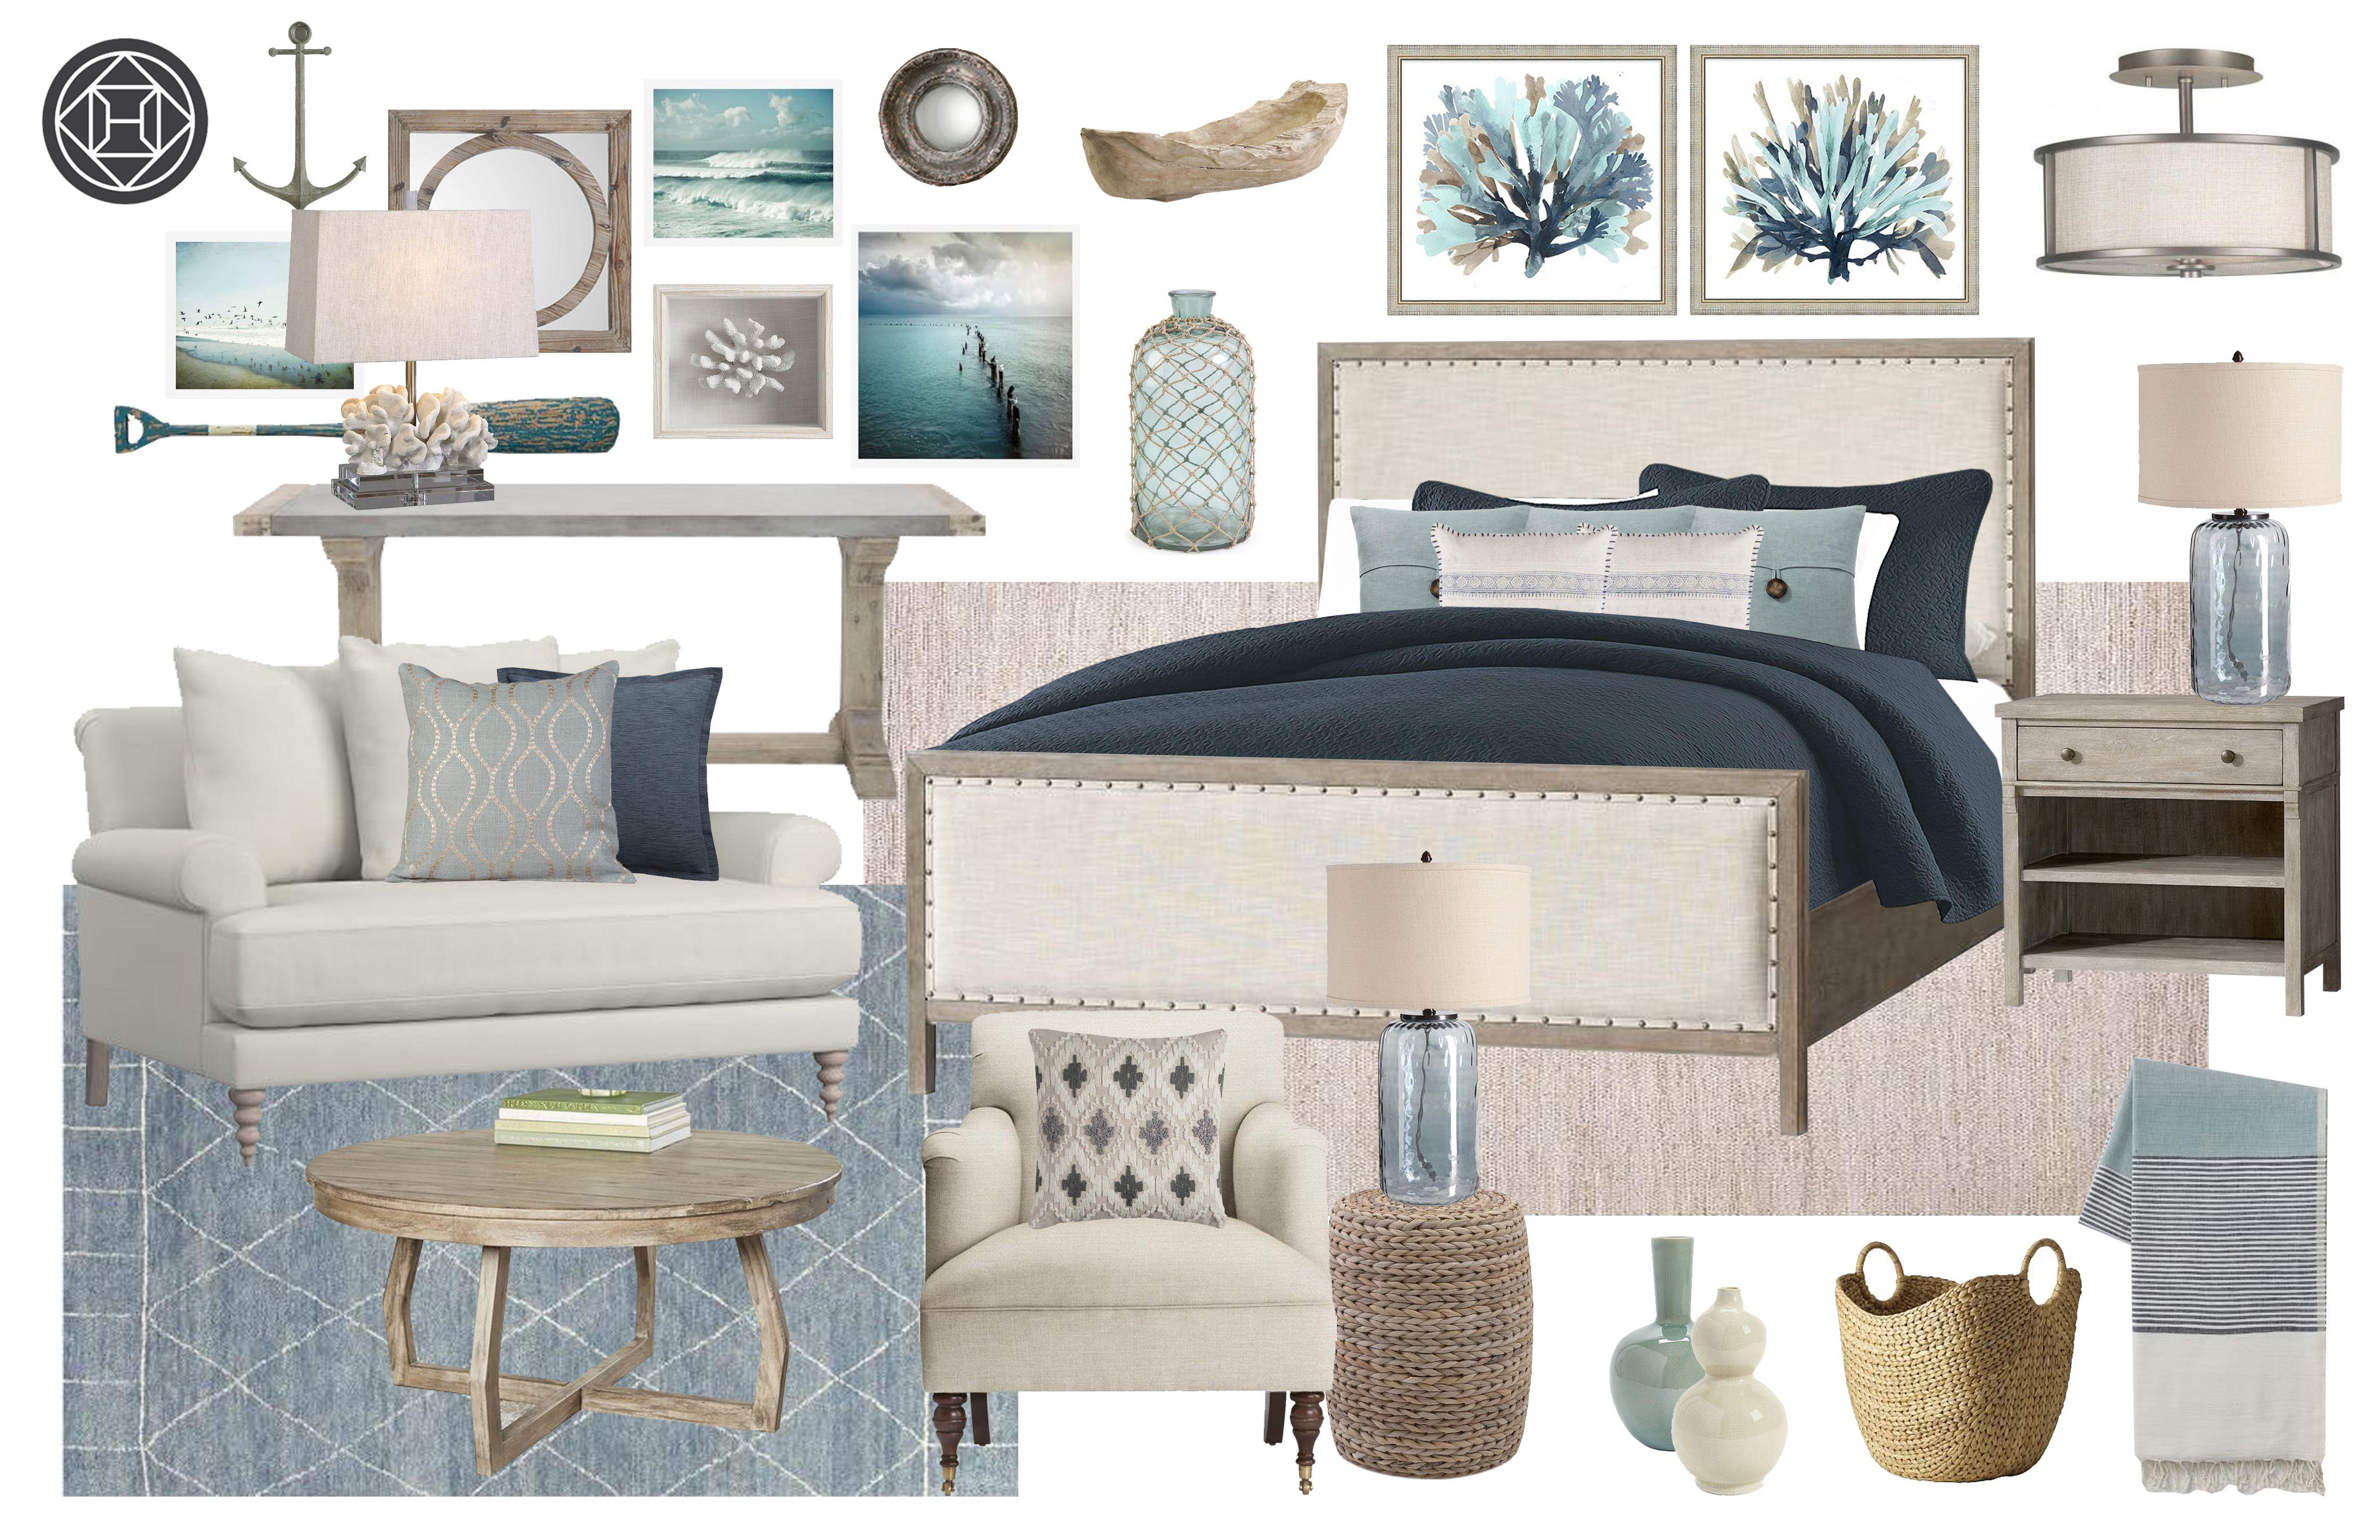 Classic Coastal Farmhouse Bedroom Design By Havenly Interior Designer Lacey Interior Design Farmhouse Bedroom Bedroom Design